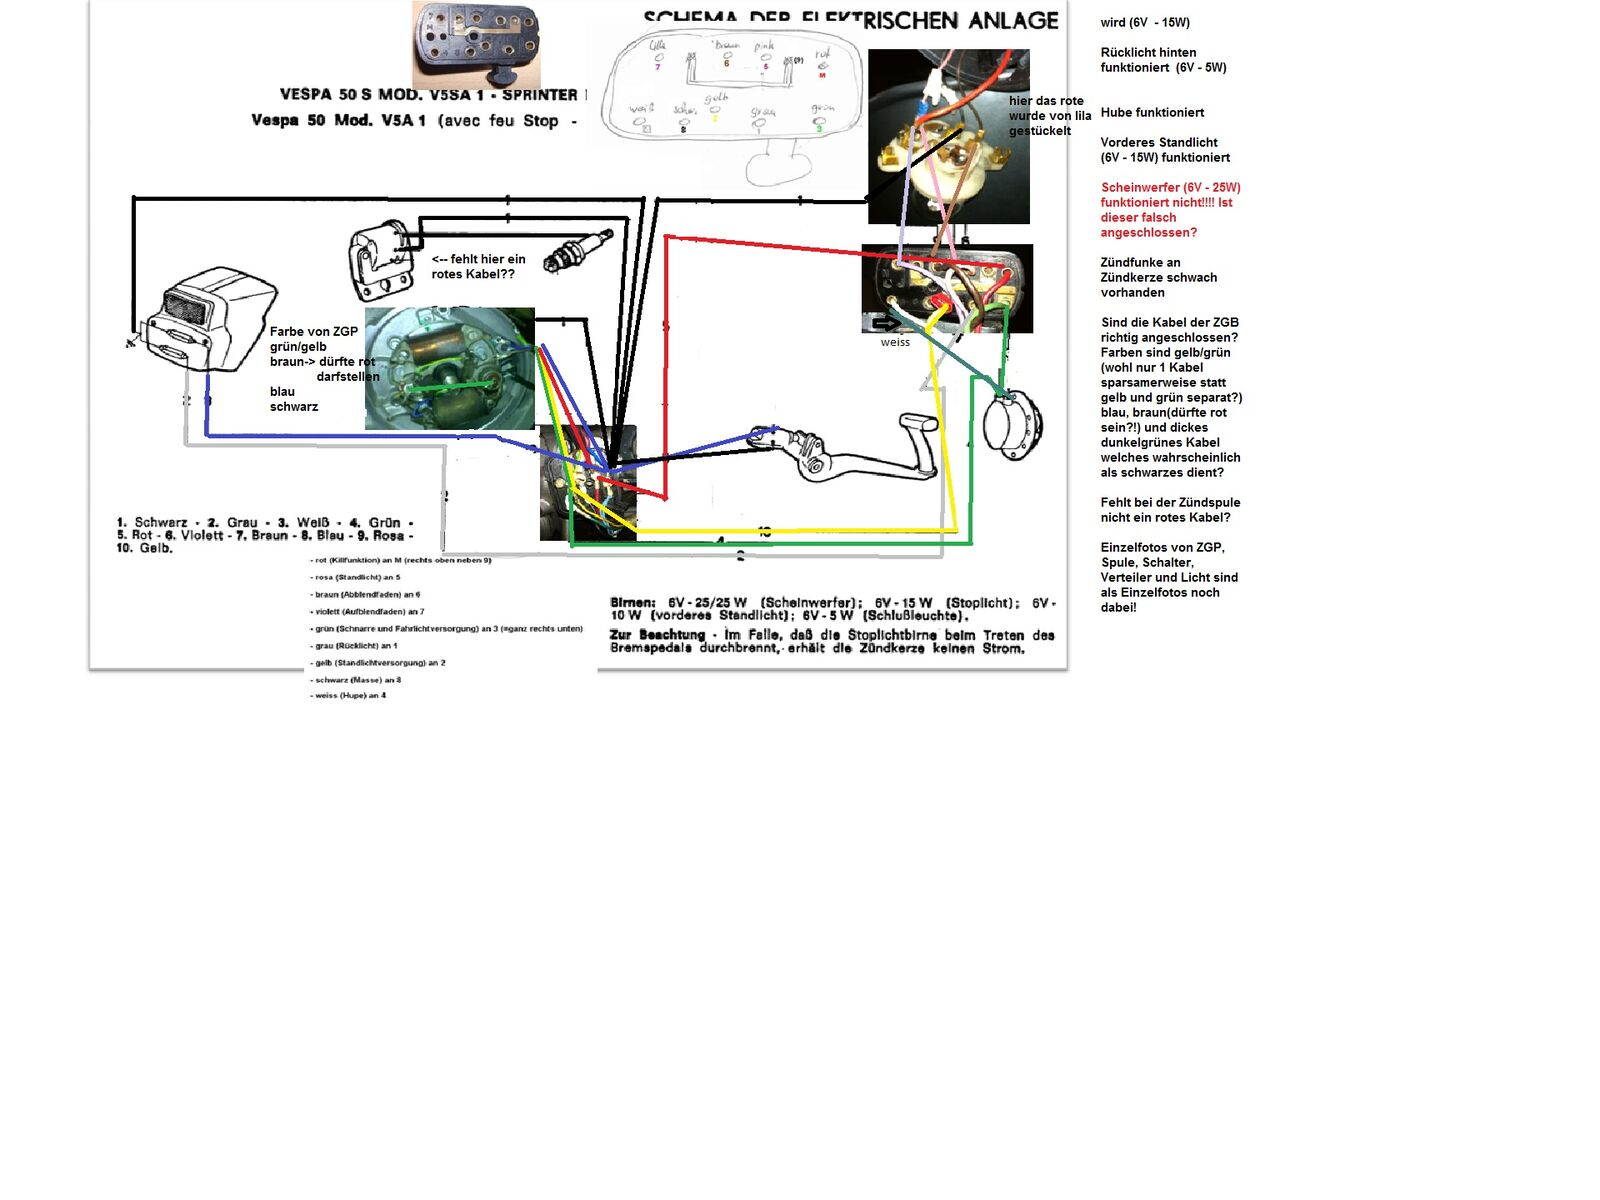 Berühmt Verkabelung Funktioniert Ideen - Elektrische Schaltplan ...